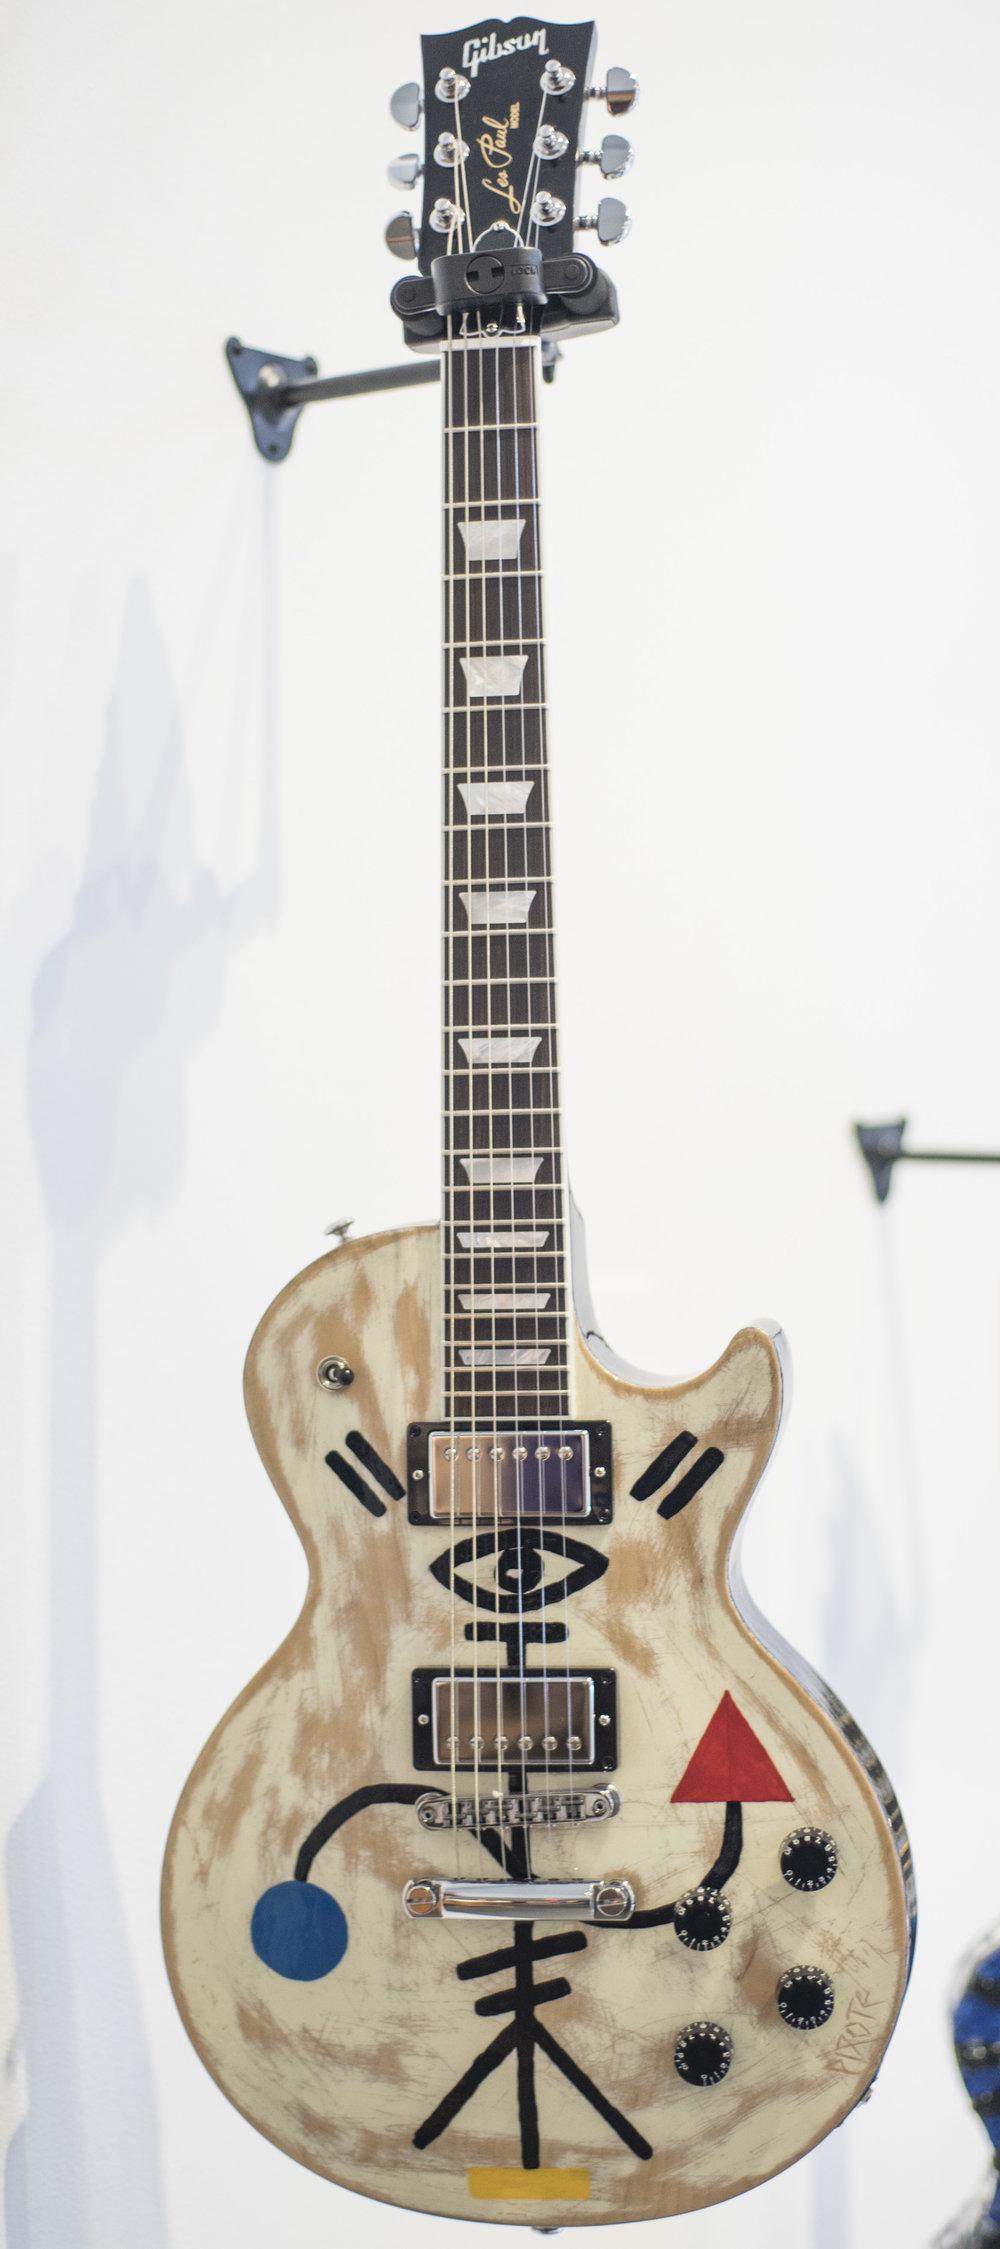 VH1 x Gibson, 2017